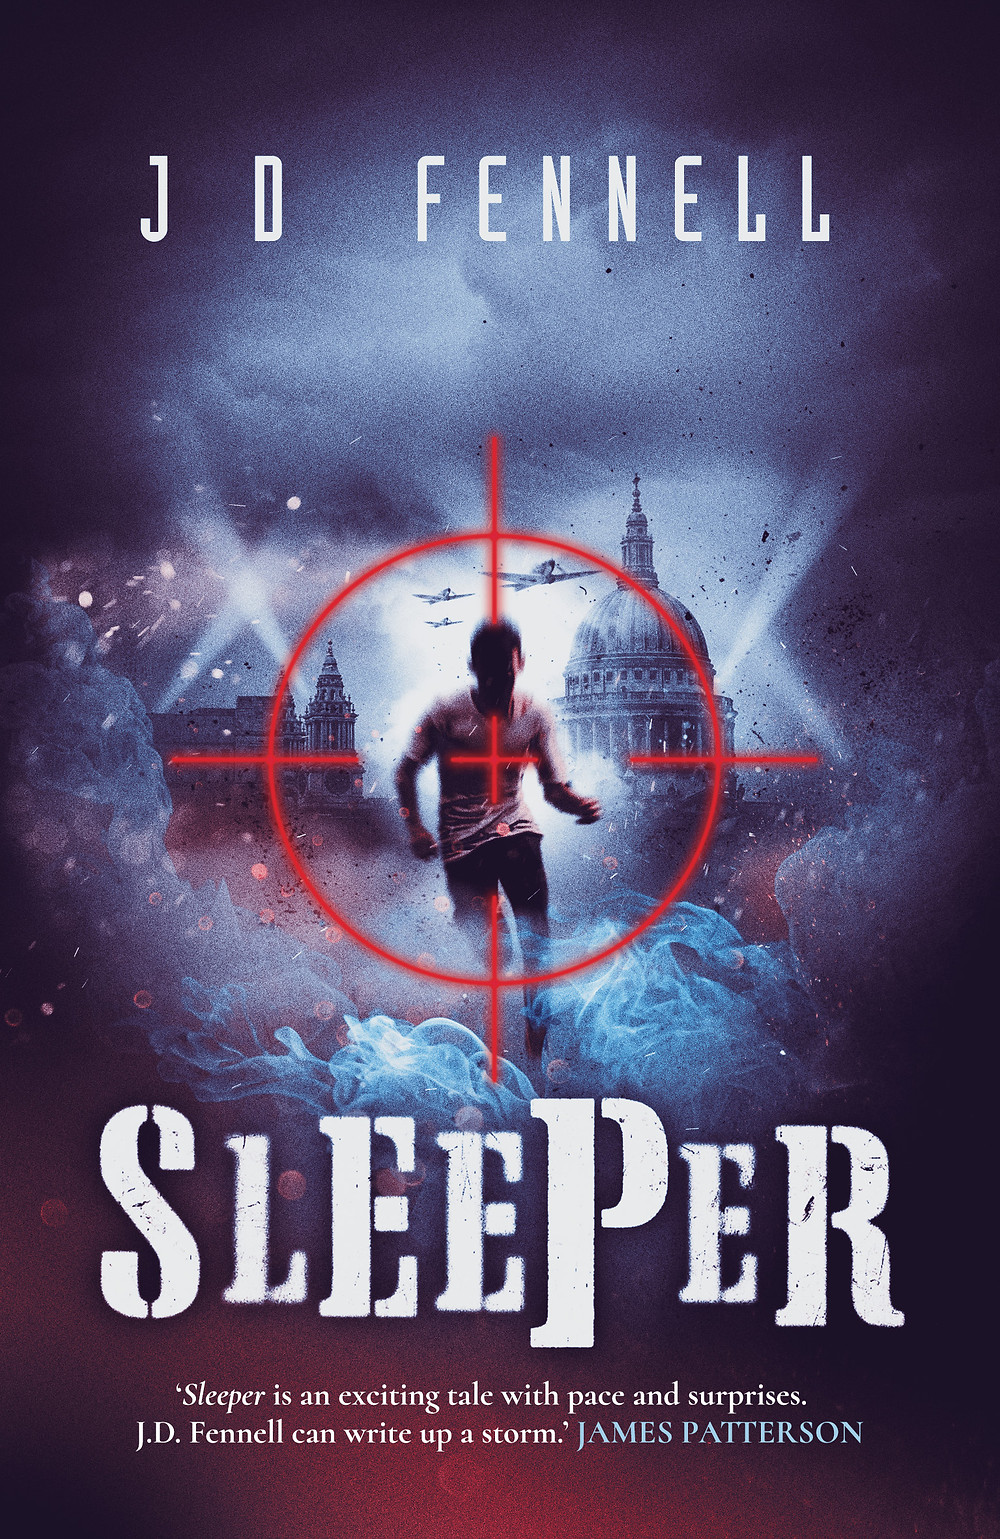 Sleeper by J D Fennell